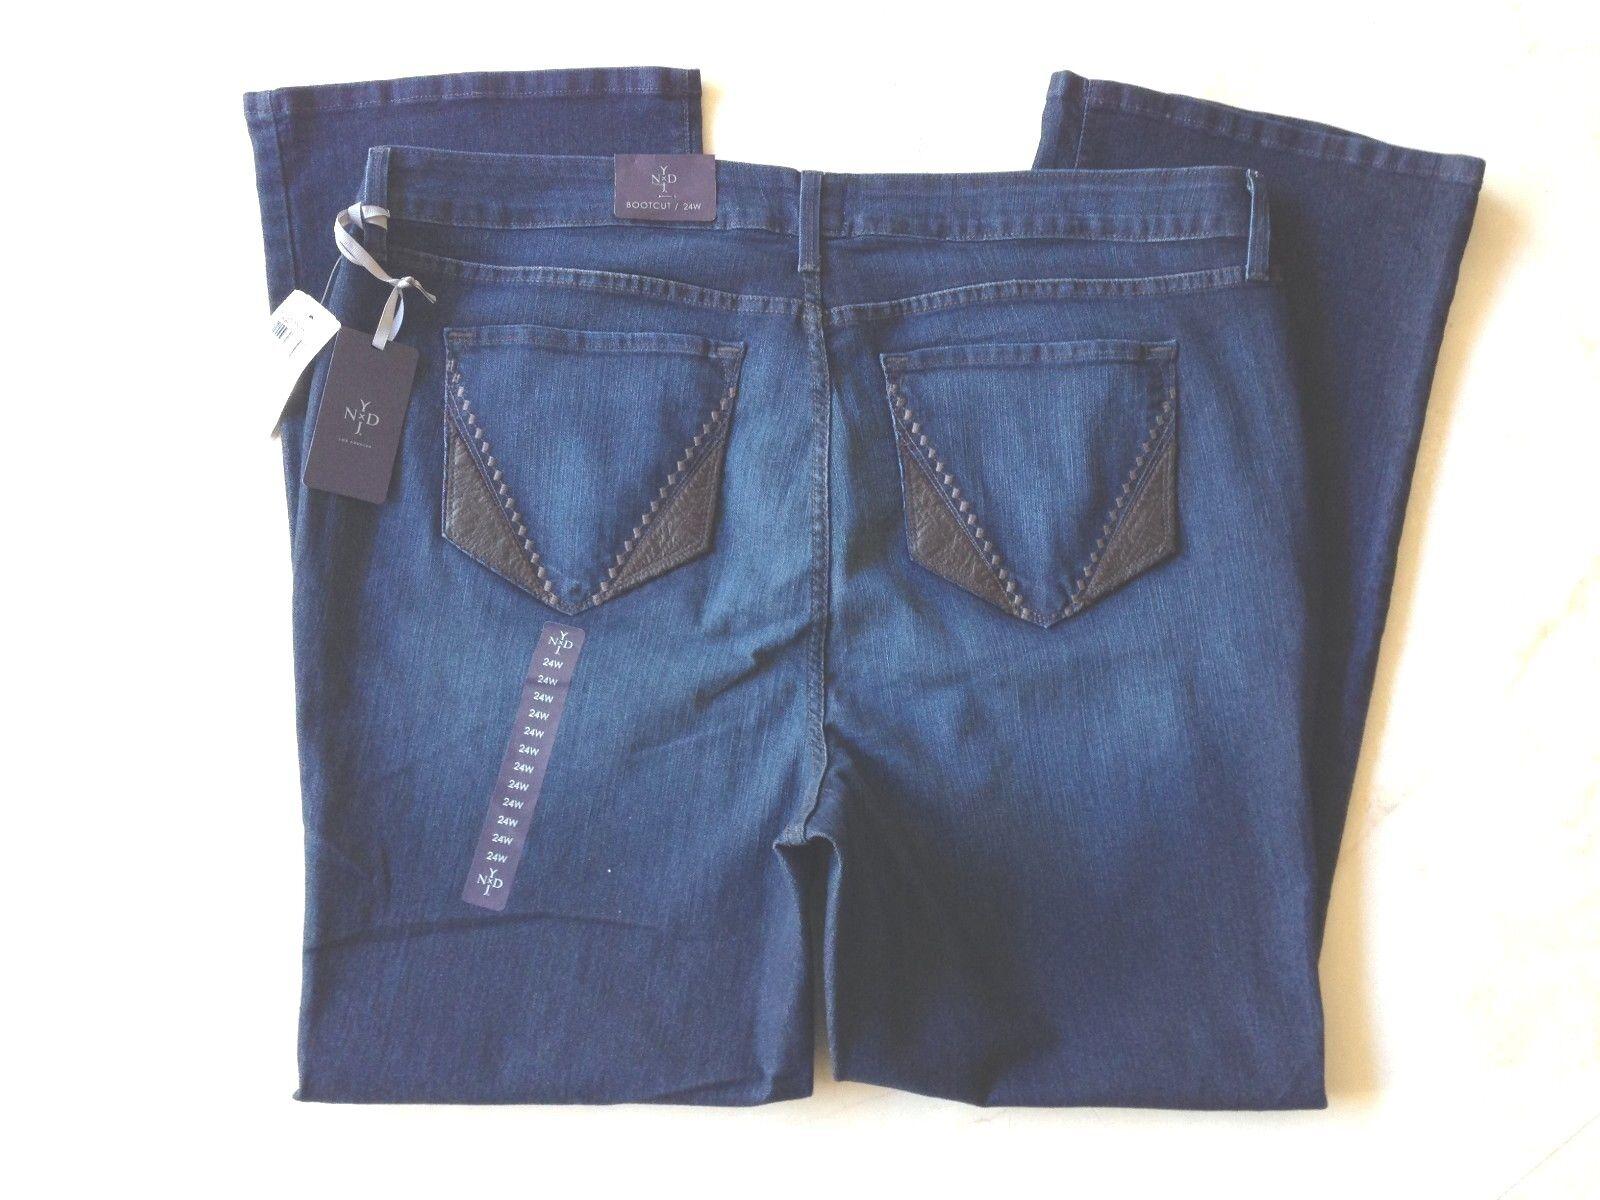 NYDJ Burbk Slimming Bootcut Jeans Plus Size 24W Retail  140 NWT